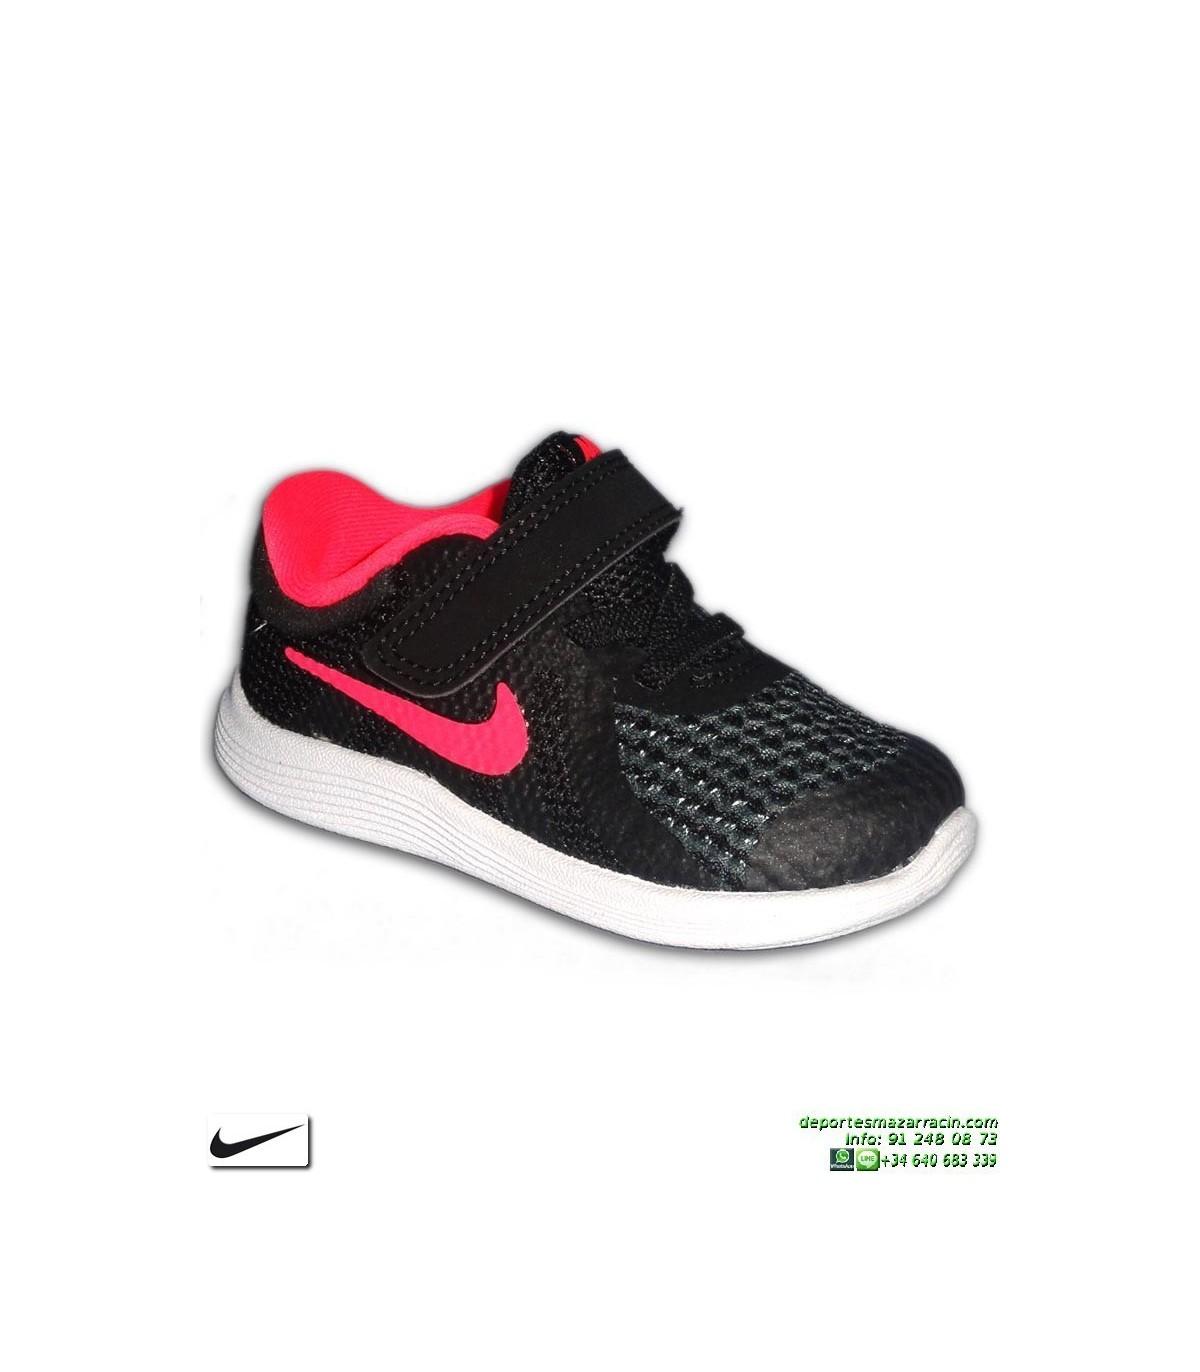 54205d3ec Zapatilla Infantil NIKE REVOLUTION 4 Niña Velcro negro-rosa TDV